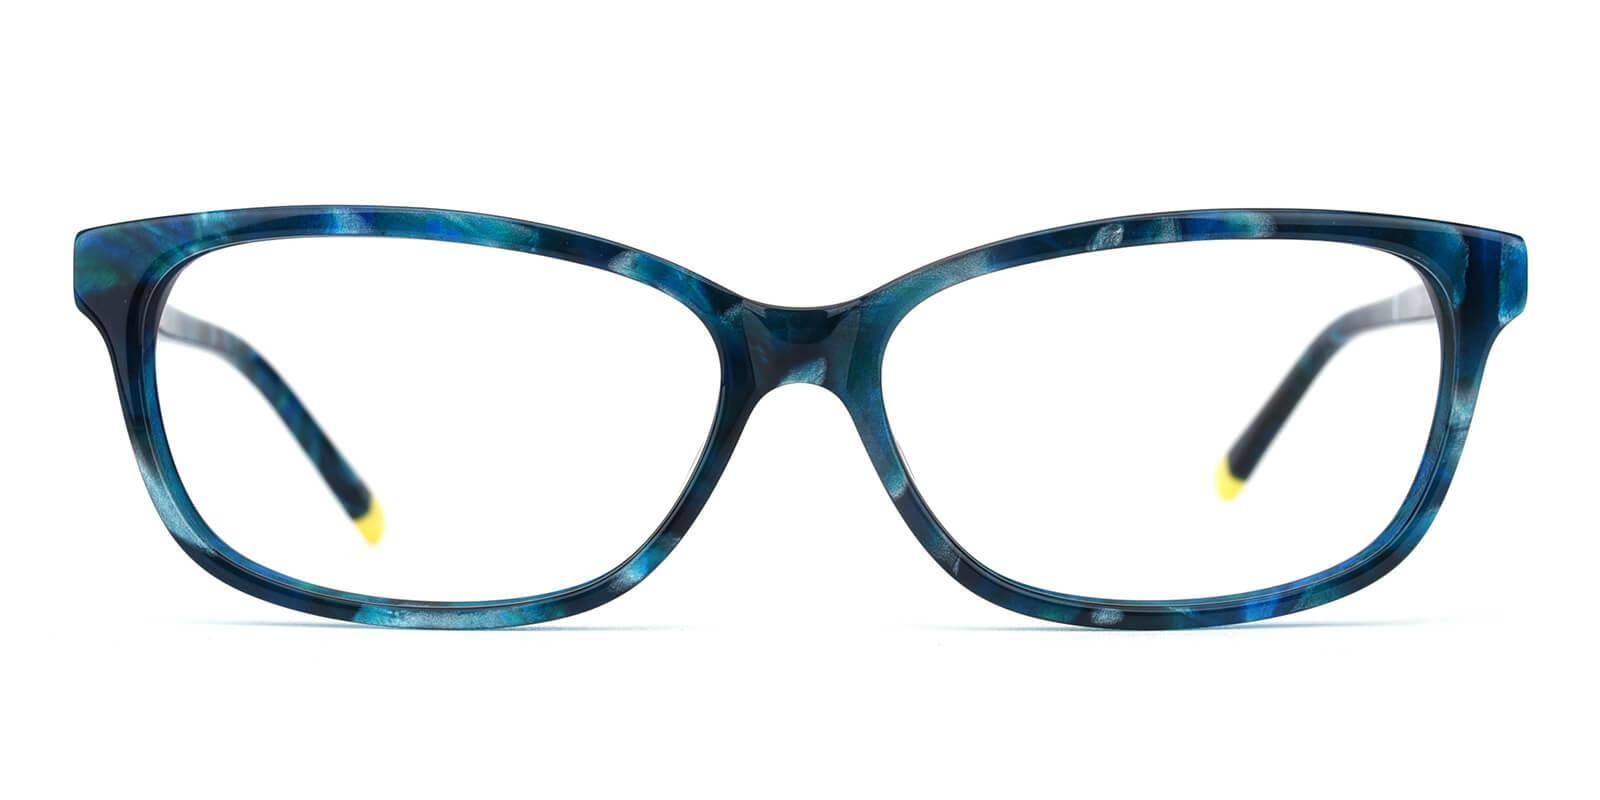 Zion-Blue-Cat-Acetate-Eyeglasses-additional2